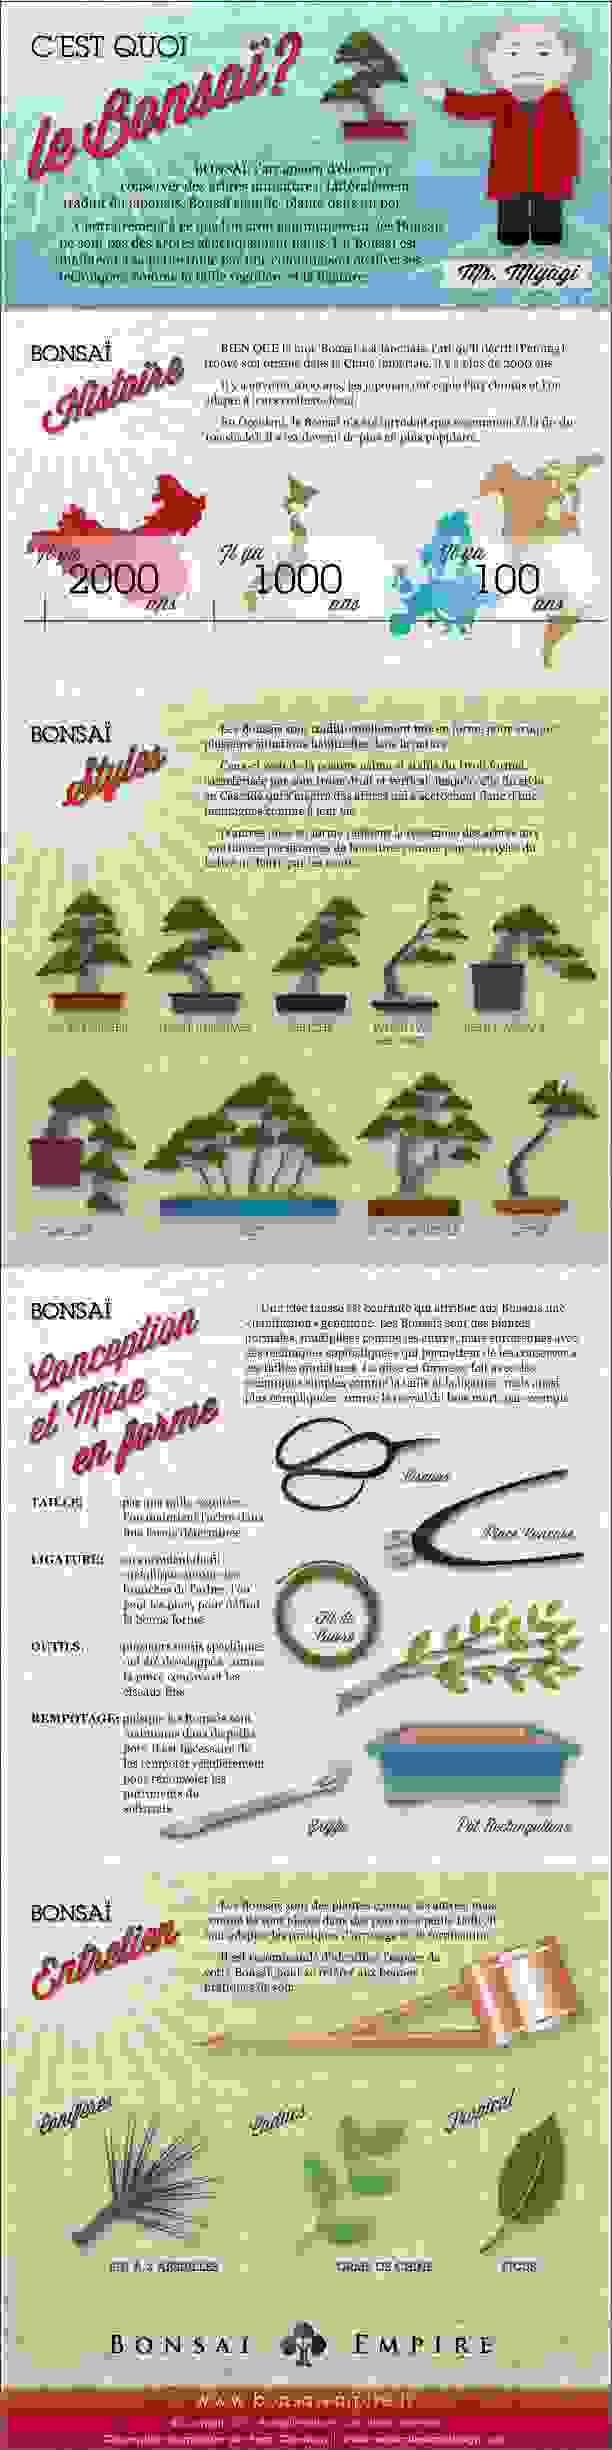 bonsai-infographie-mr-miyagi-neozone-2016